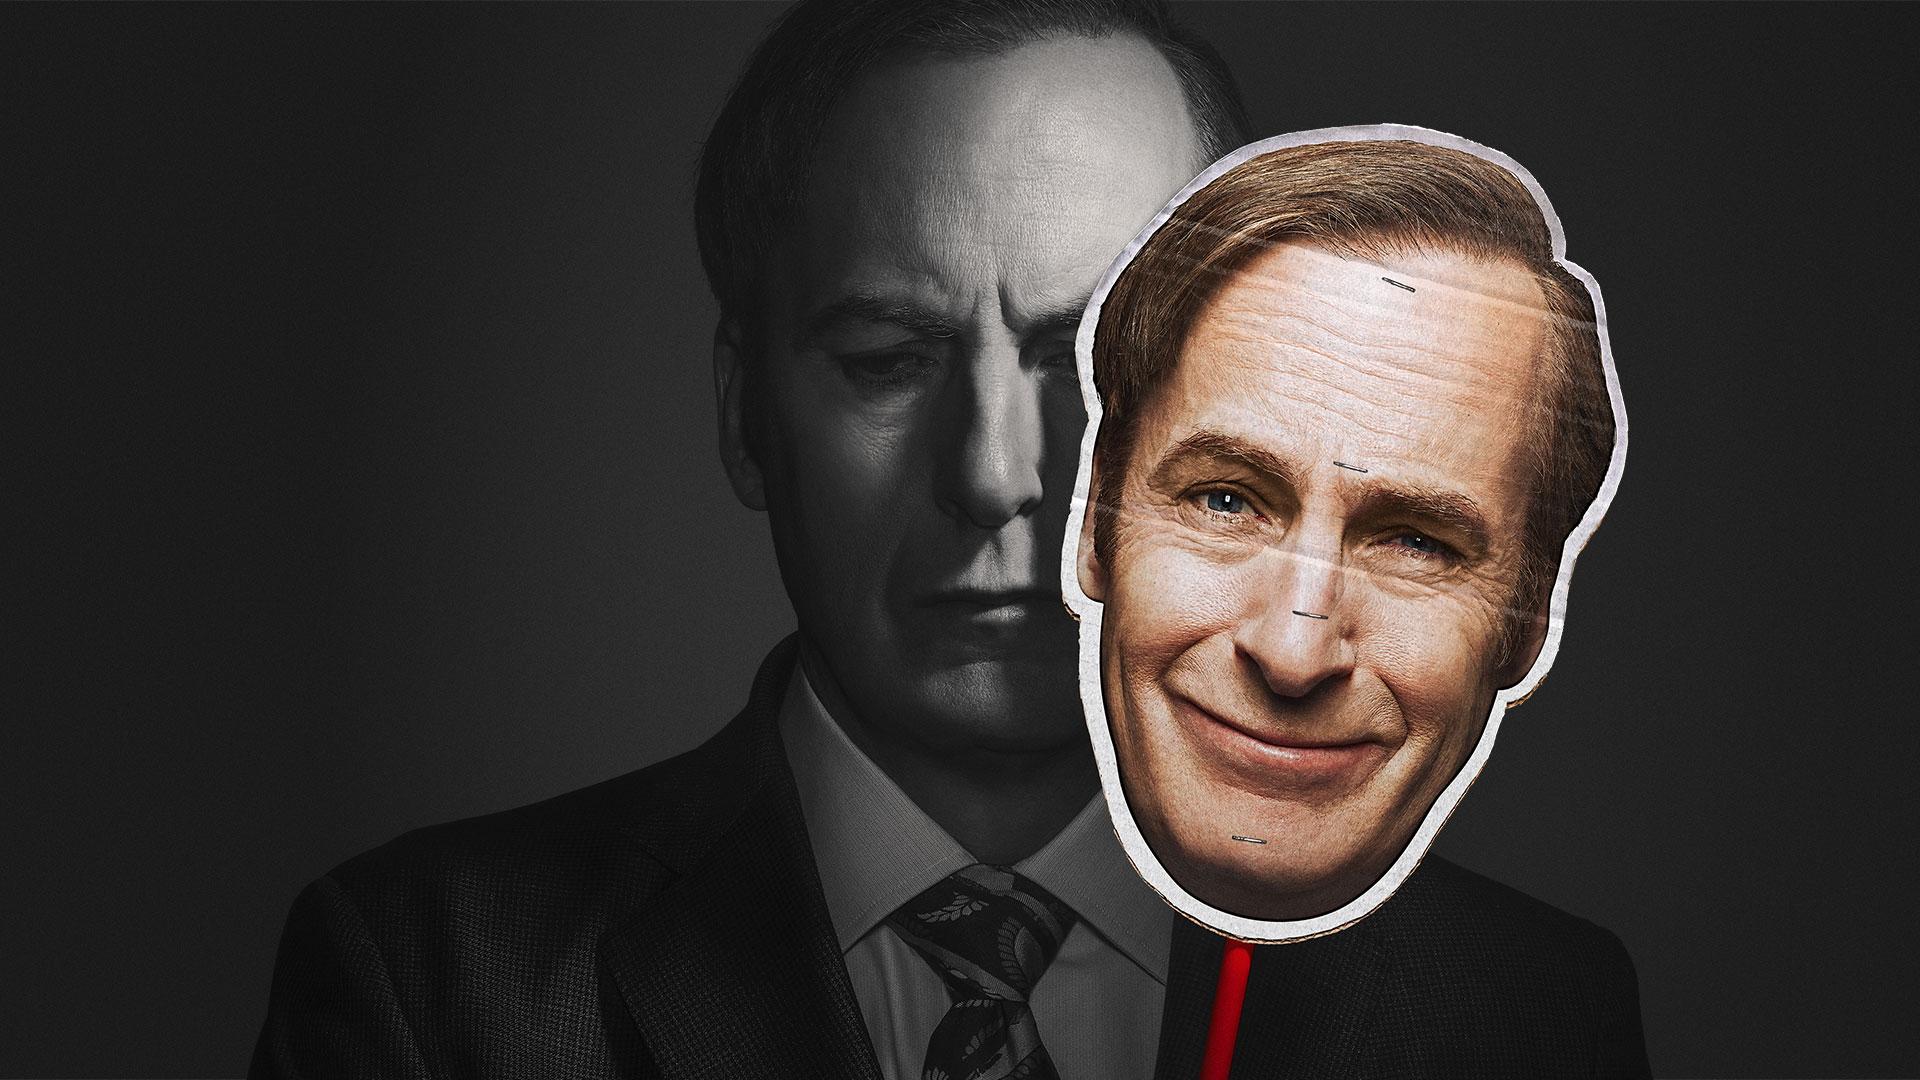 Better Call Saul TV Show Cancelled?